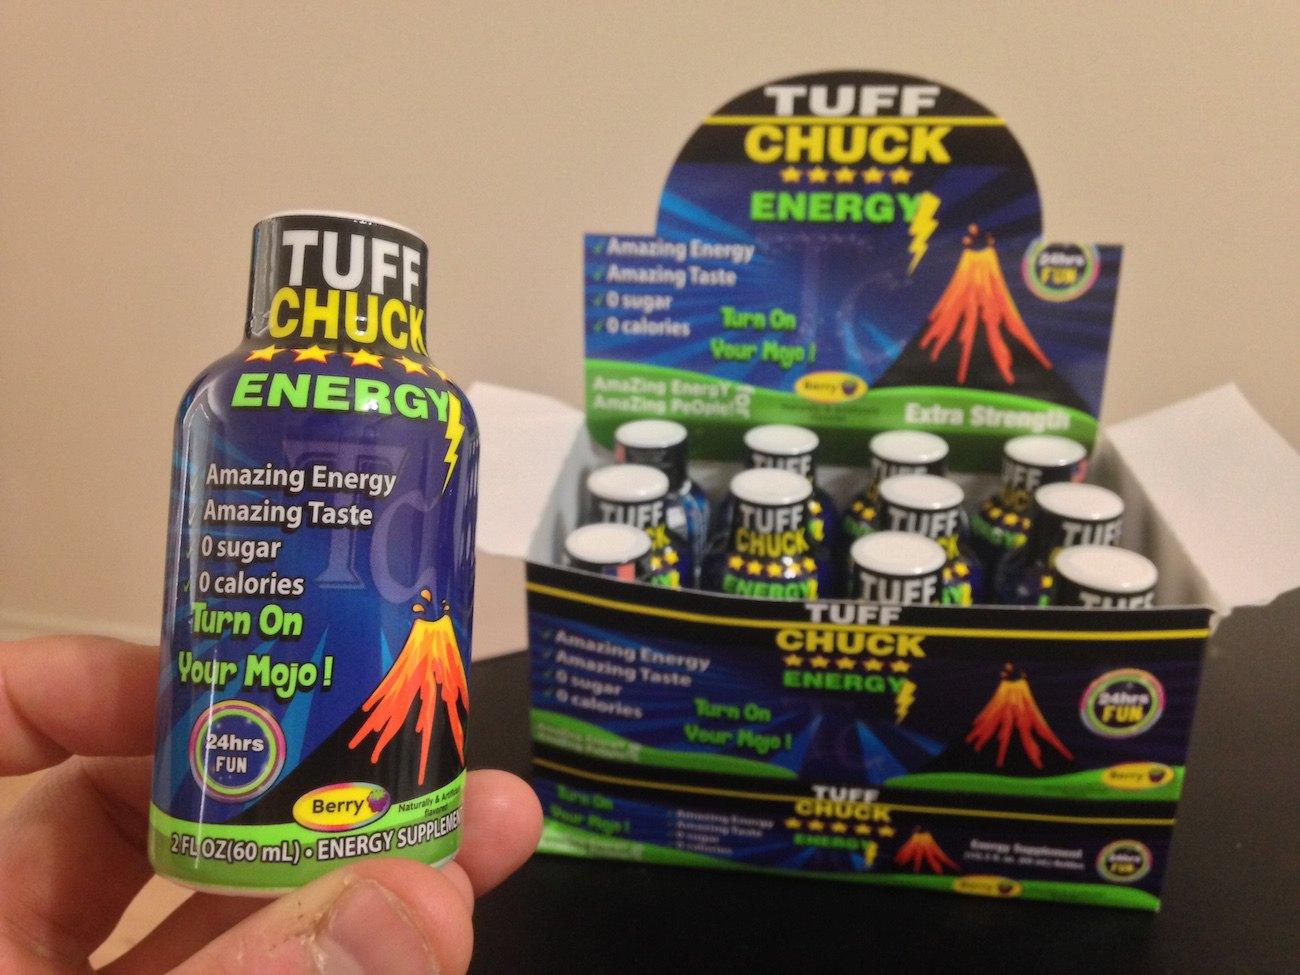 TUFF CHUCK – Turn On Your MOJO & Get Amazing Energy